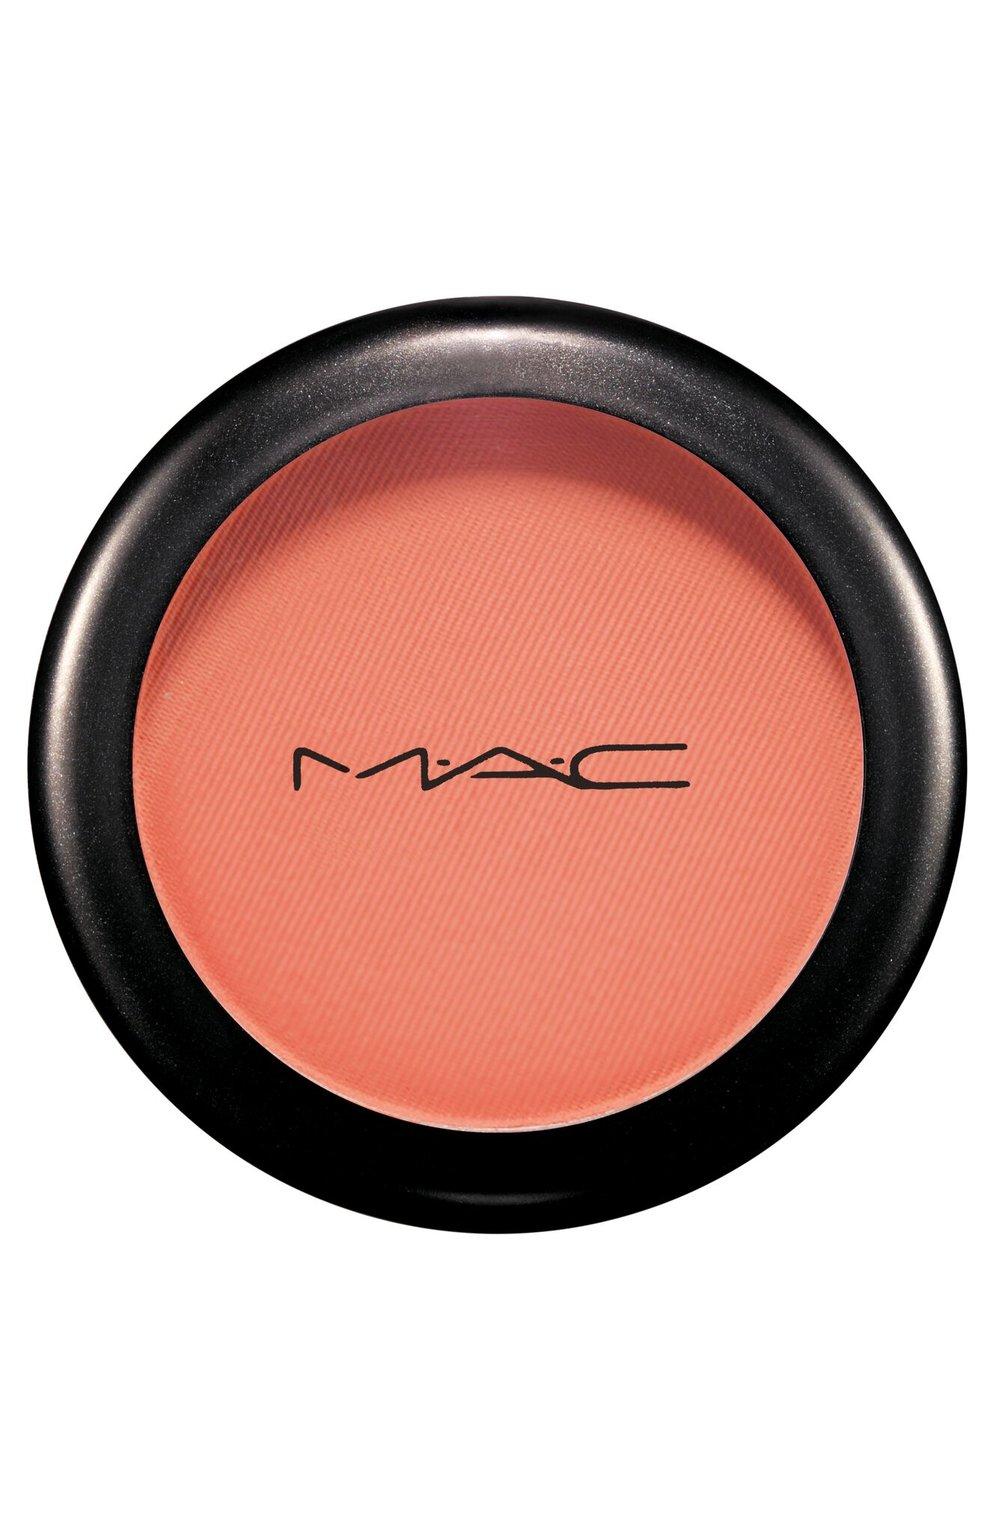 MAC Blush in Peaches